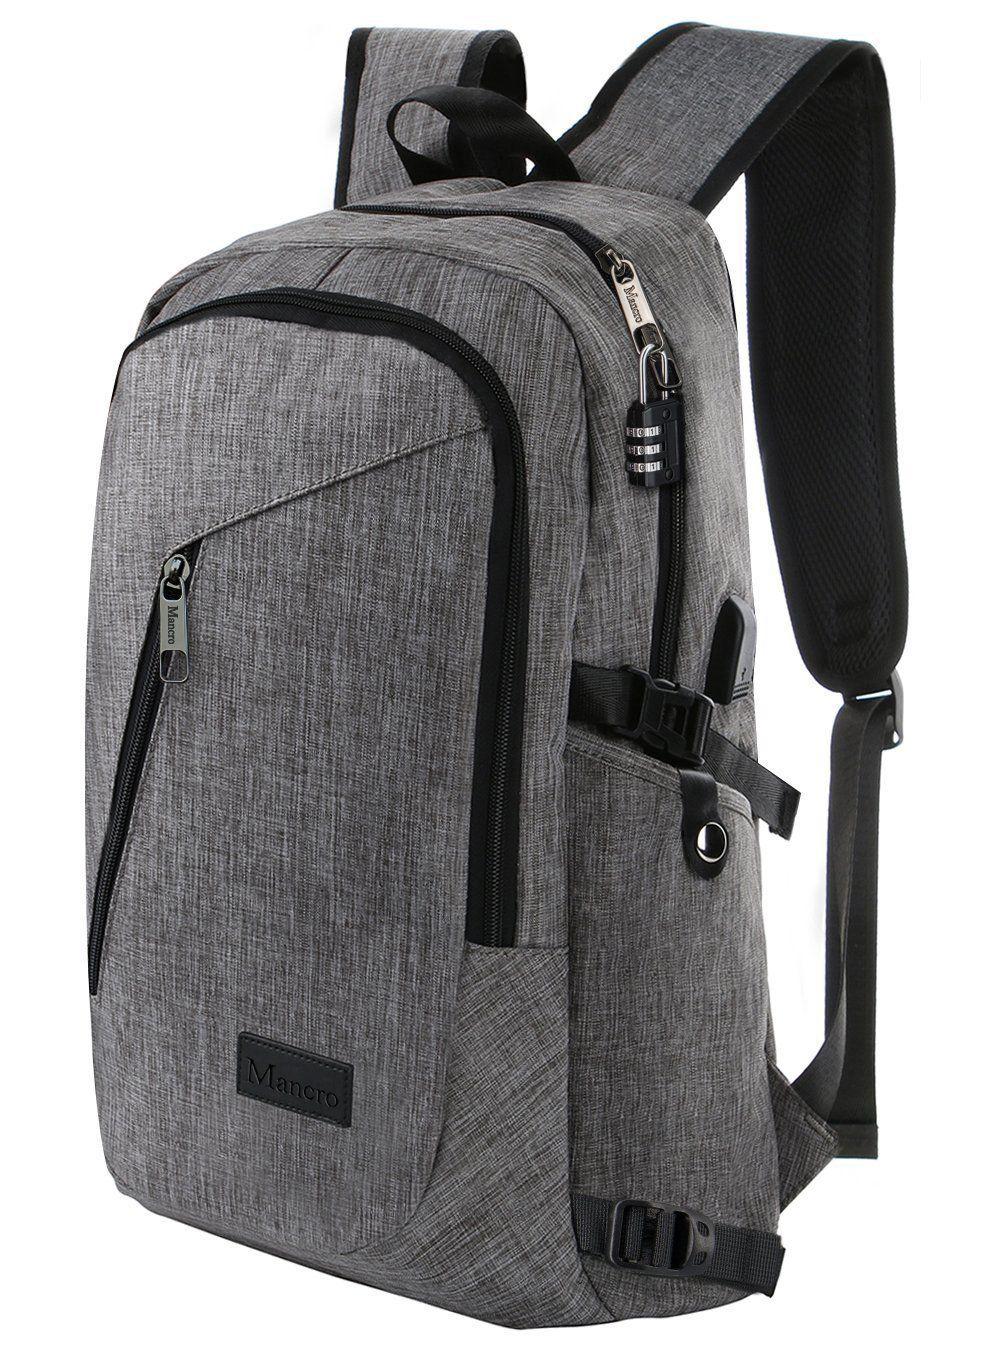 Best Travel Backpack 2017 Best Travel Backpack 2018